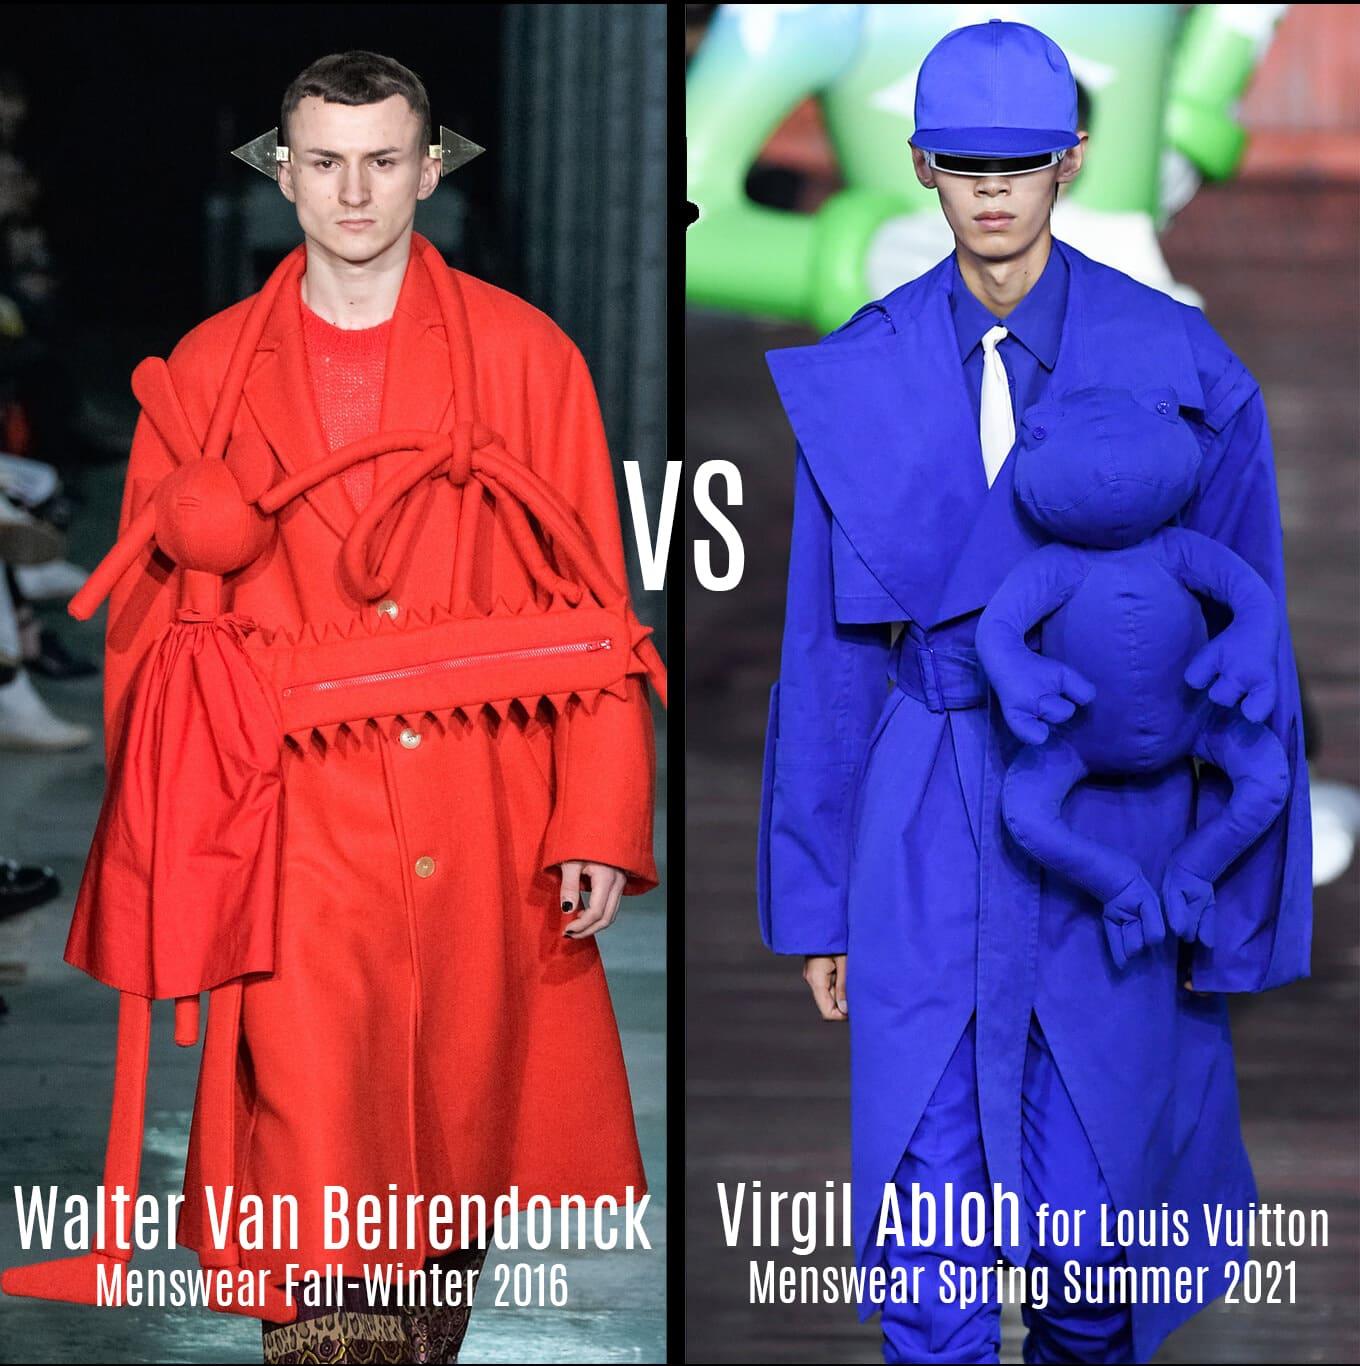 Walter Van Beirendonck Menswear Fall-Winter 2016 VS Virgil Abloh for Louis Vuitton Menswear Spring Summer 2021